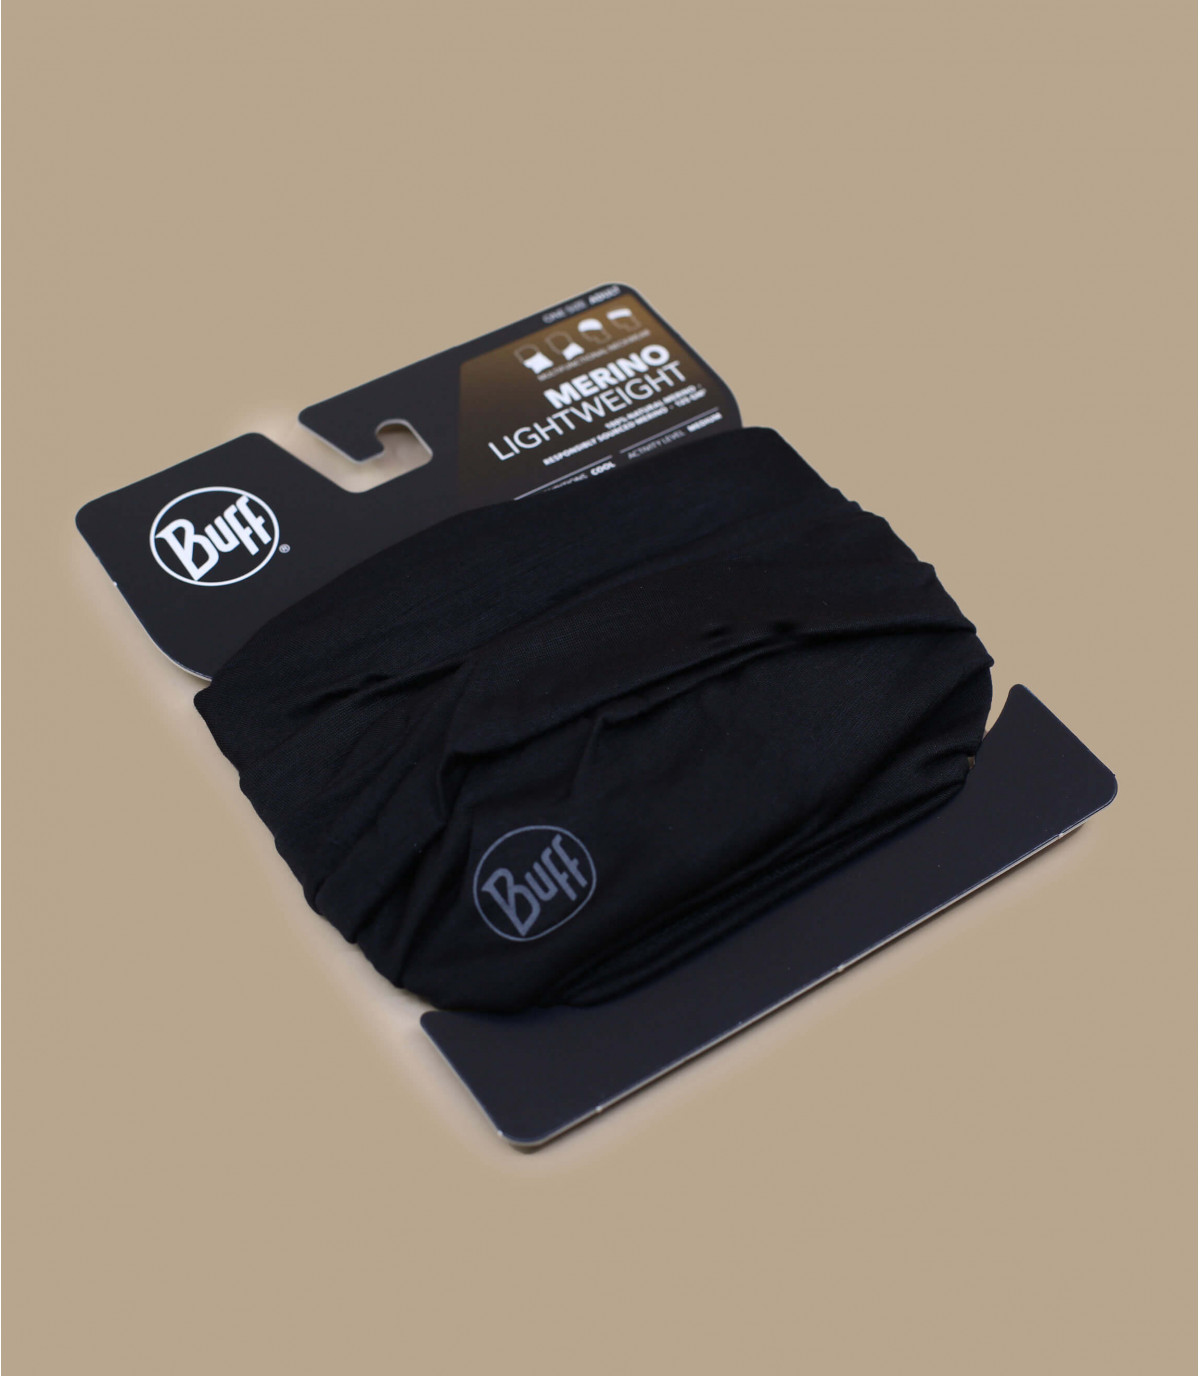 Détails Lightweight Merino Wool solid black - image 2